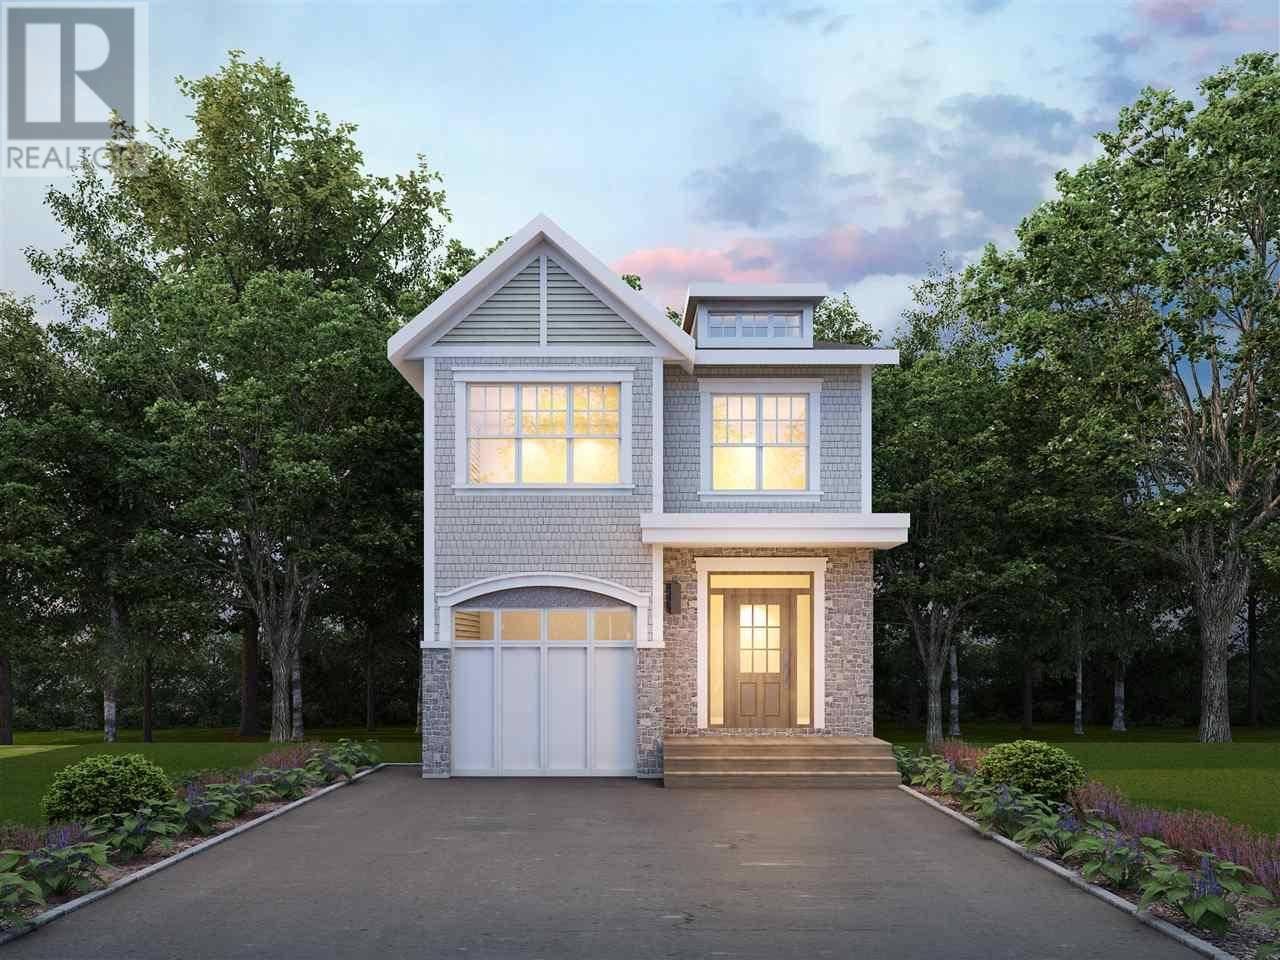 House for sale at 33 Darjeeling Dr Unit 422 Halifax Nova Scotia - MLS: 202002140